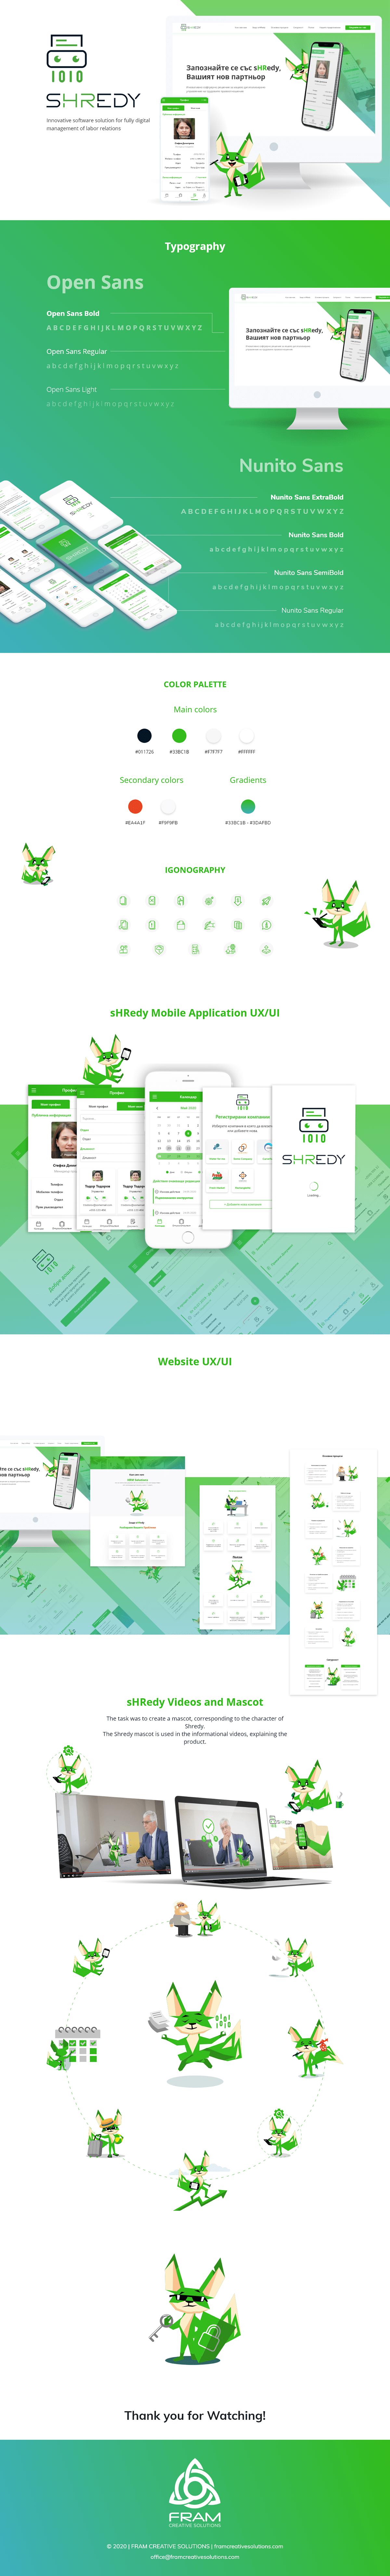 application branding  logo Mascot UI ux ux/ui